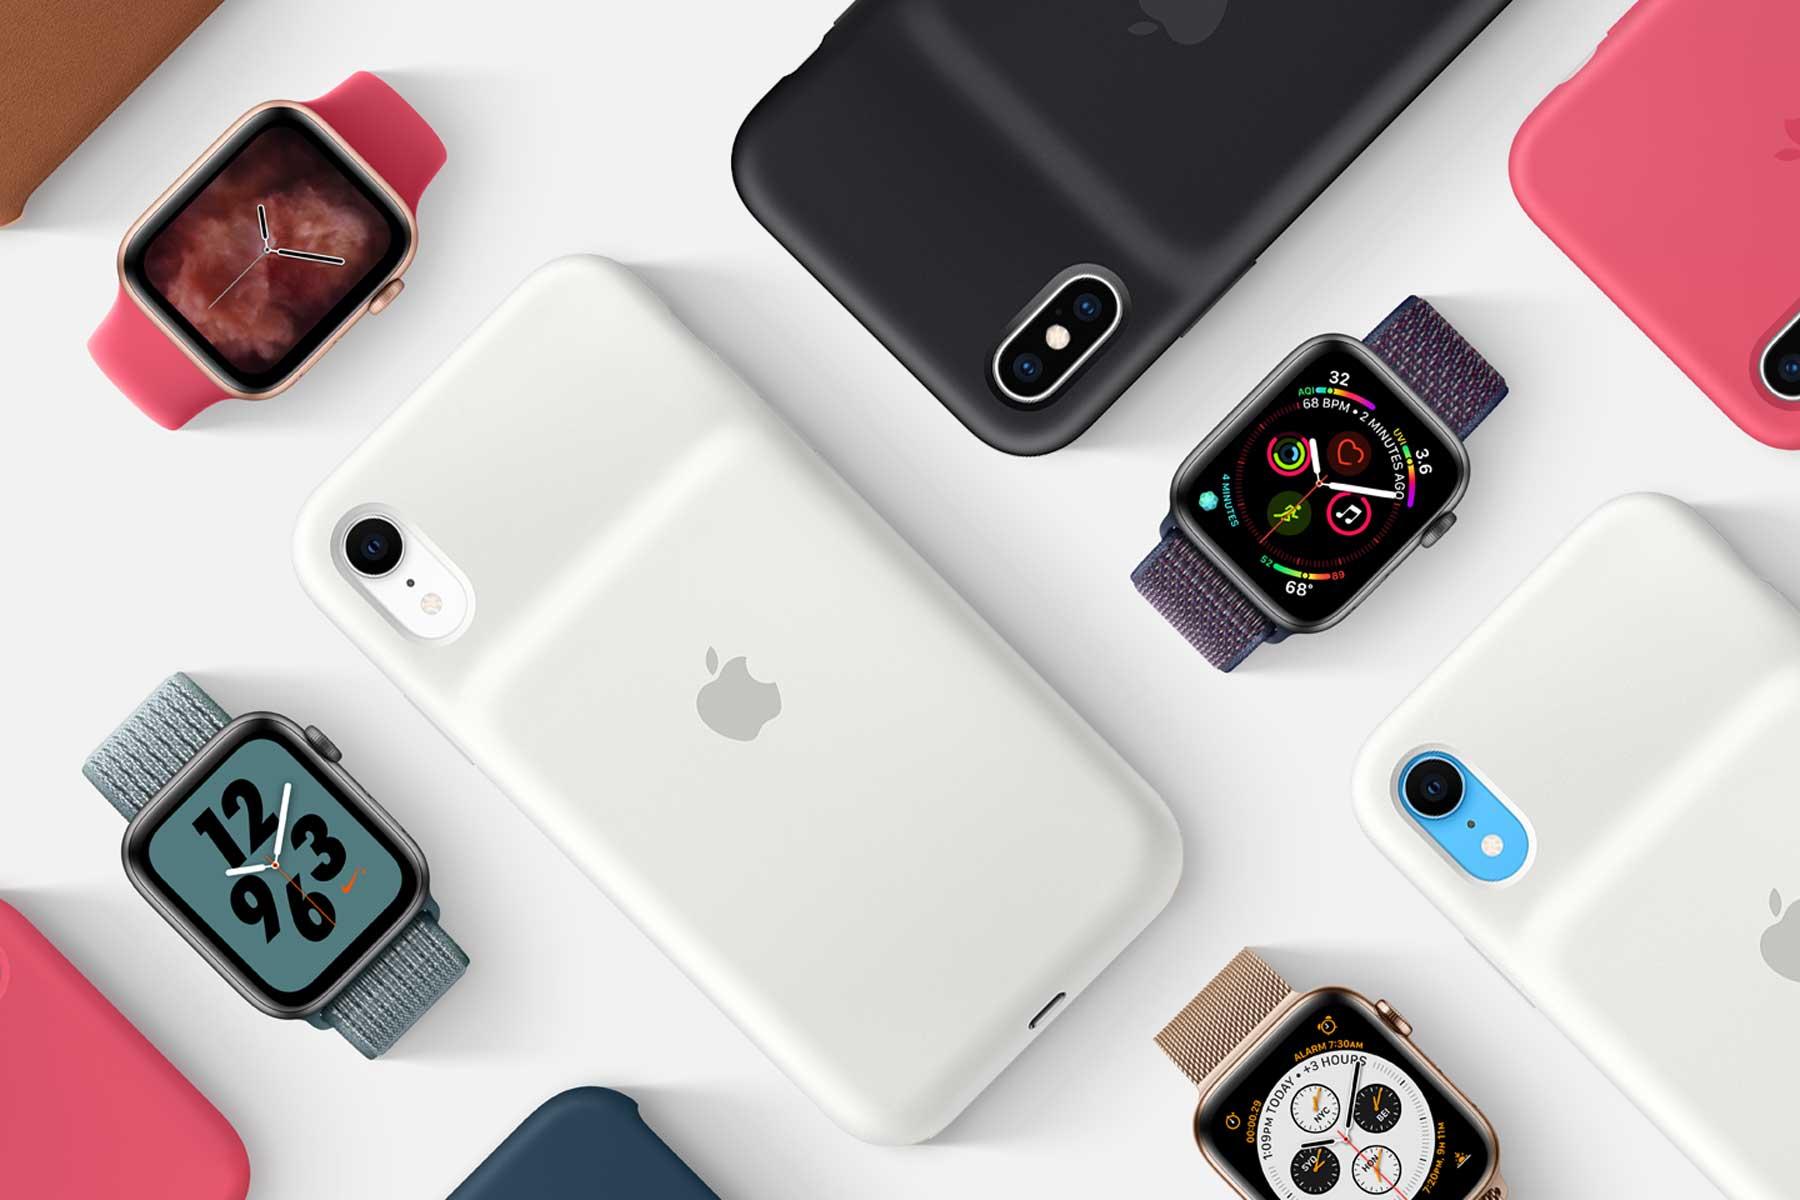 Produtos Apple (iPhones com Smart Battery Cases e Apple Watches)